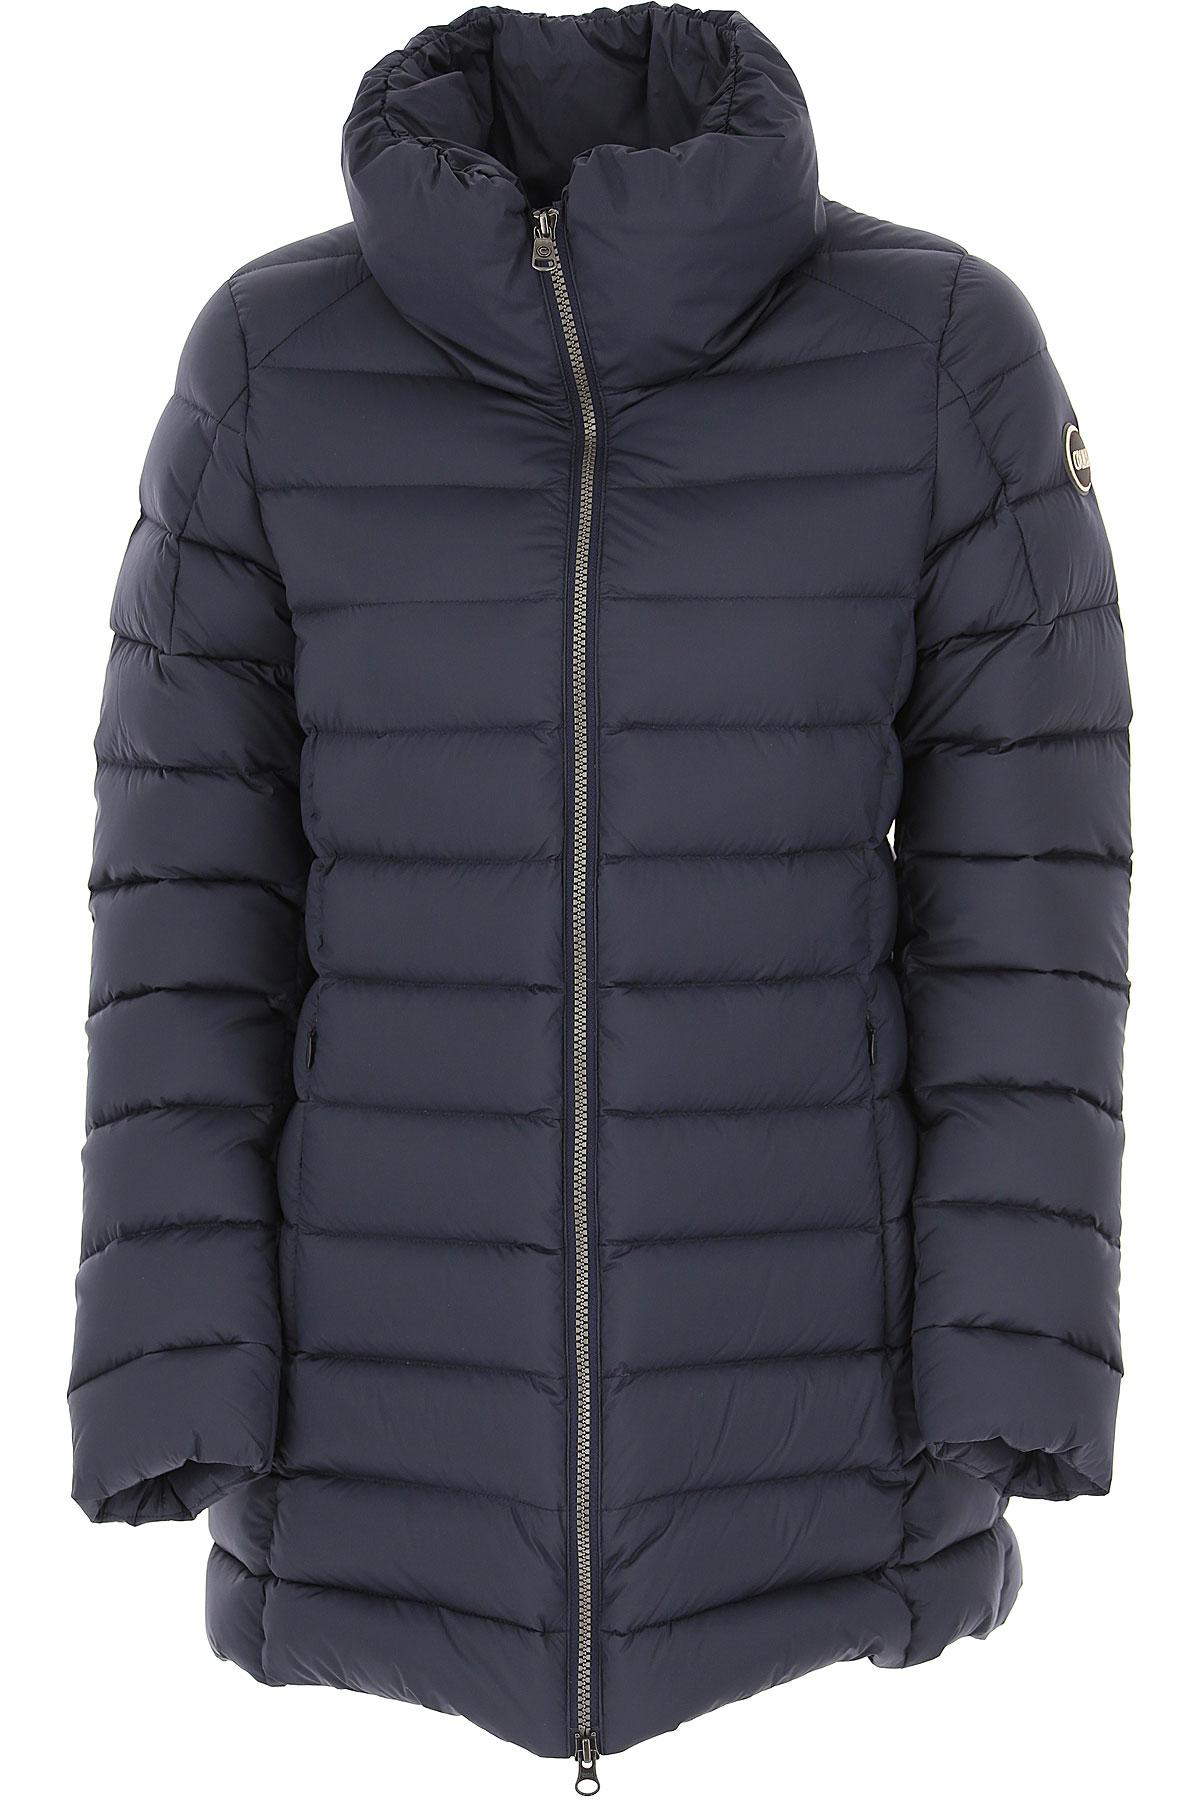 Colmar Down Jacket for Women, Puffer Ski Jacket, navy, polyamide, 2019, 2 4 6